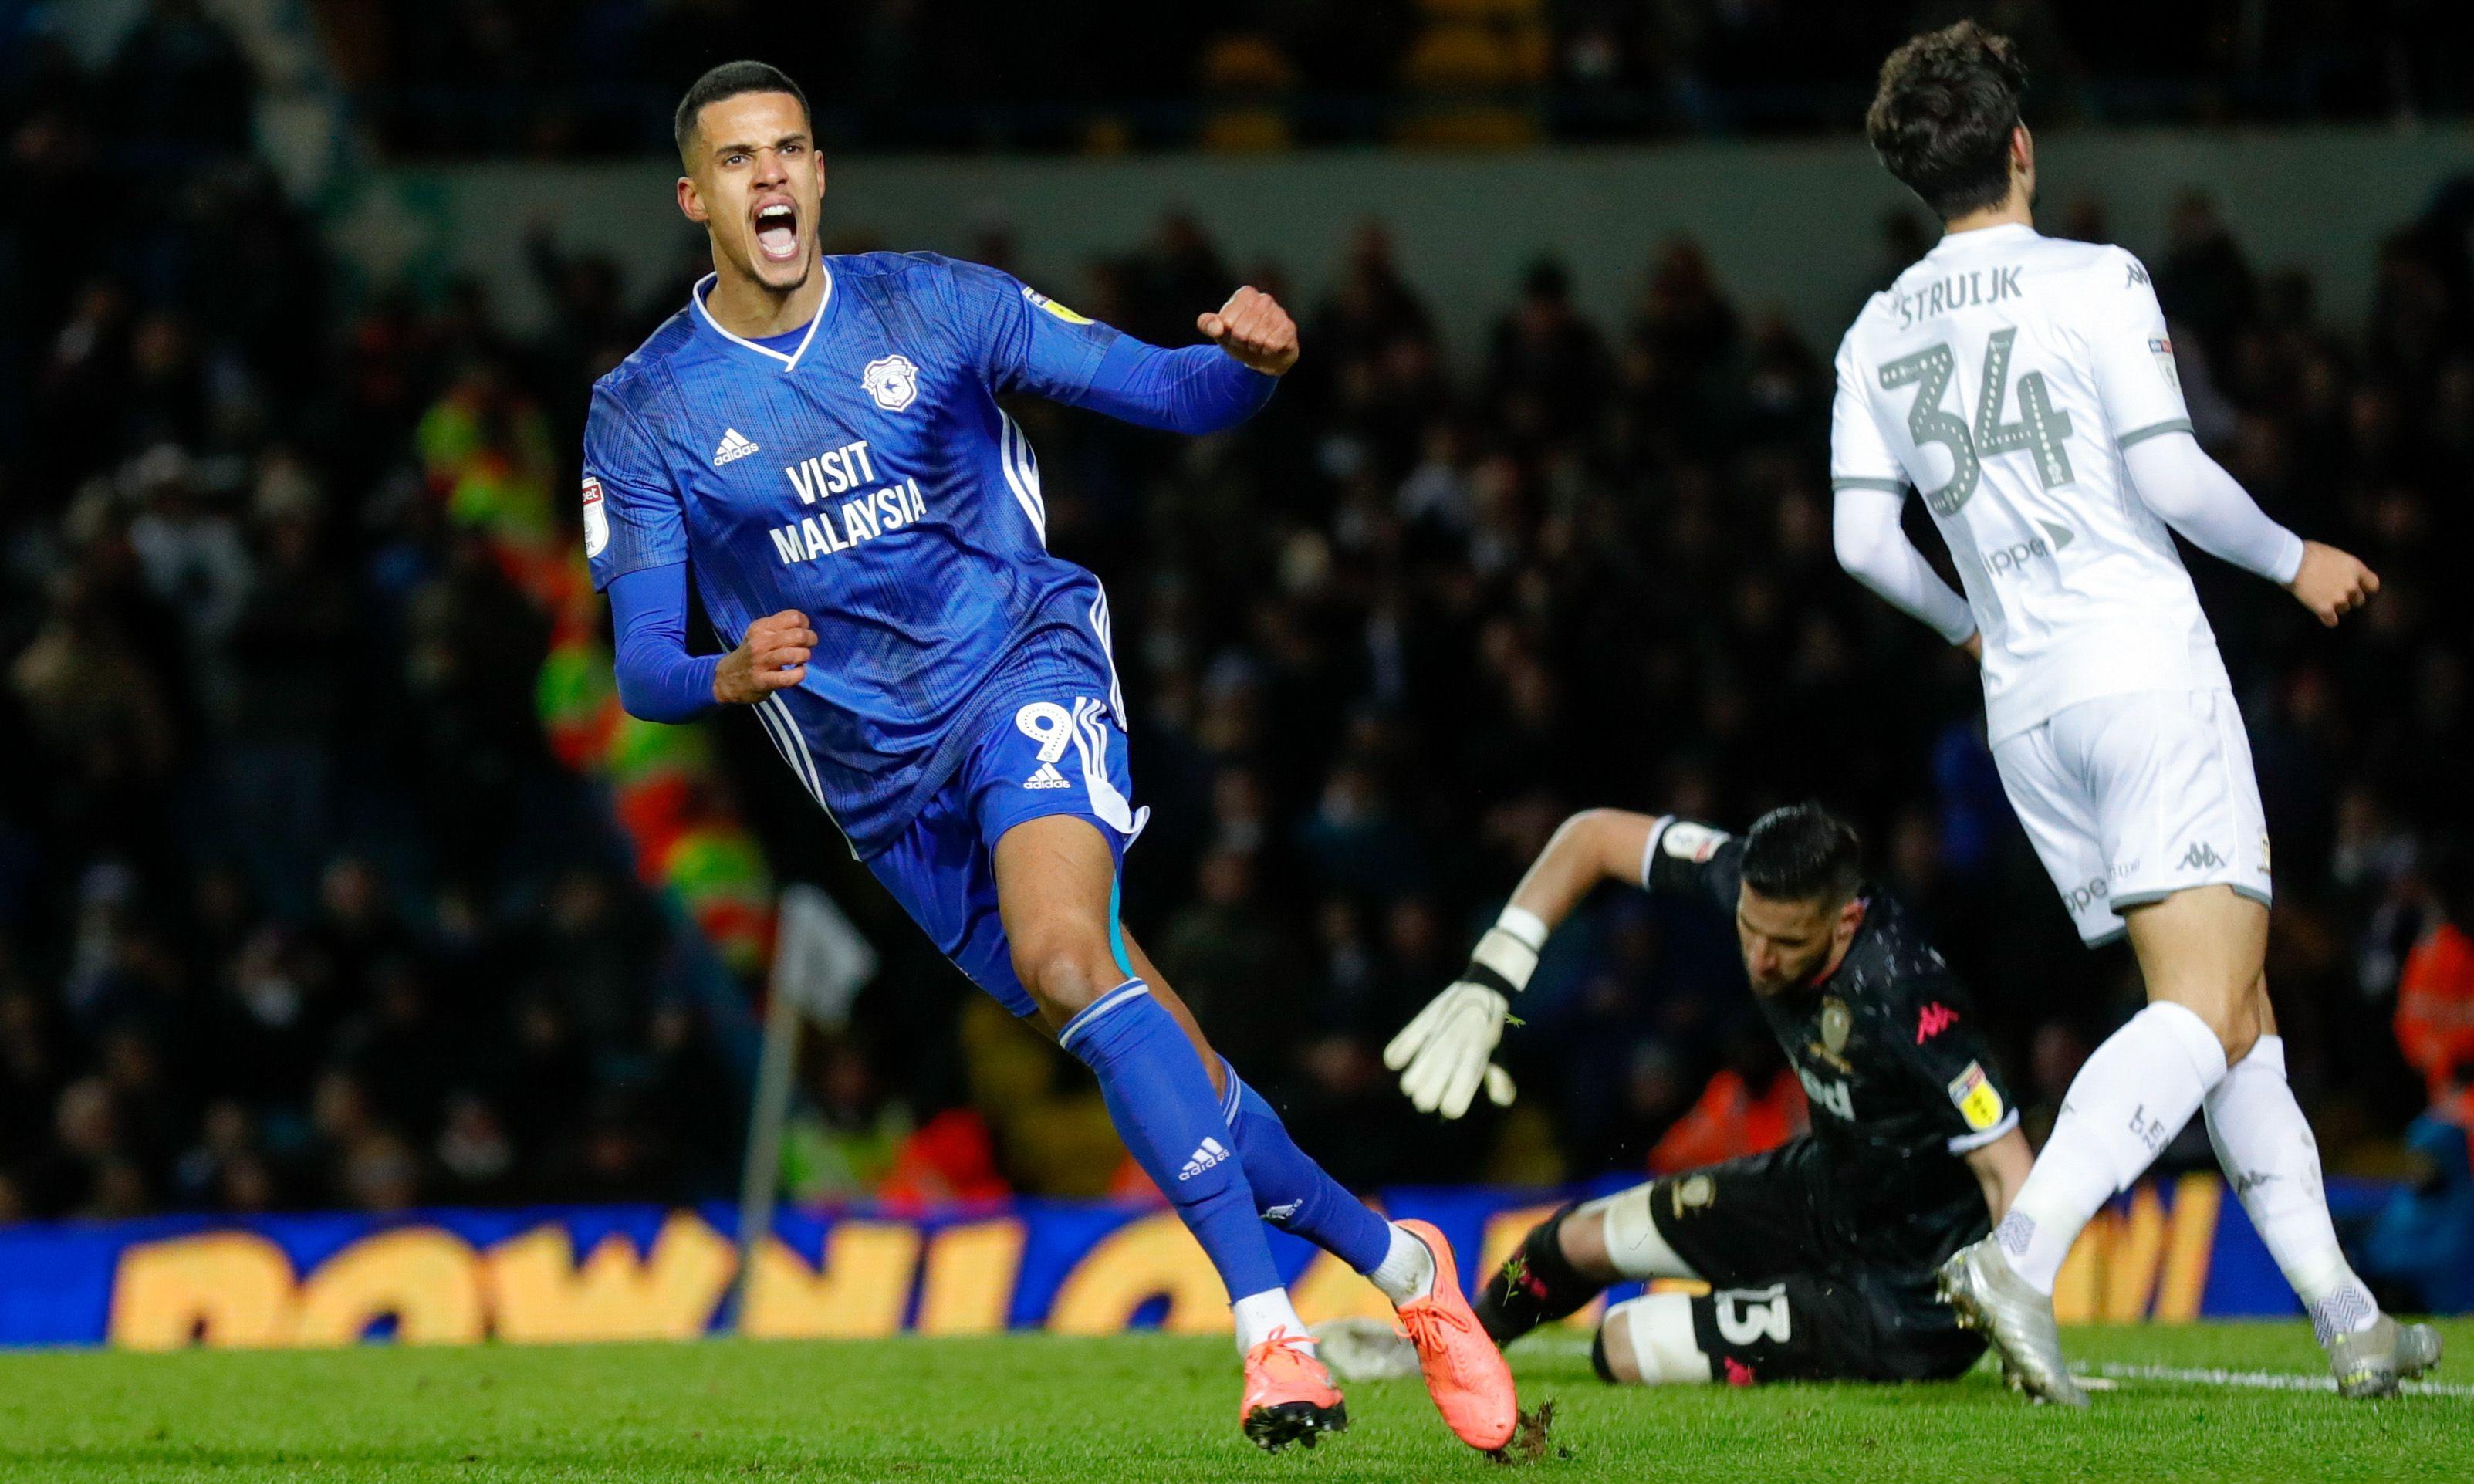 Cardiff stun Leeds as Robert Glatzel seals draw after being three down